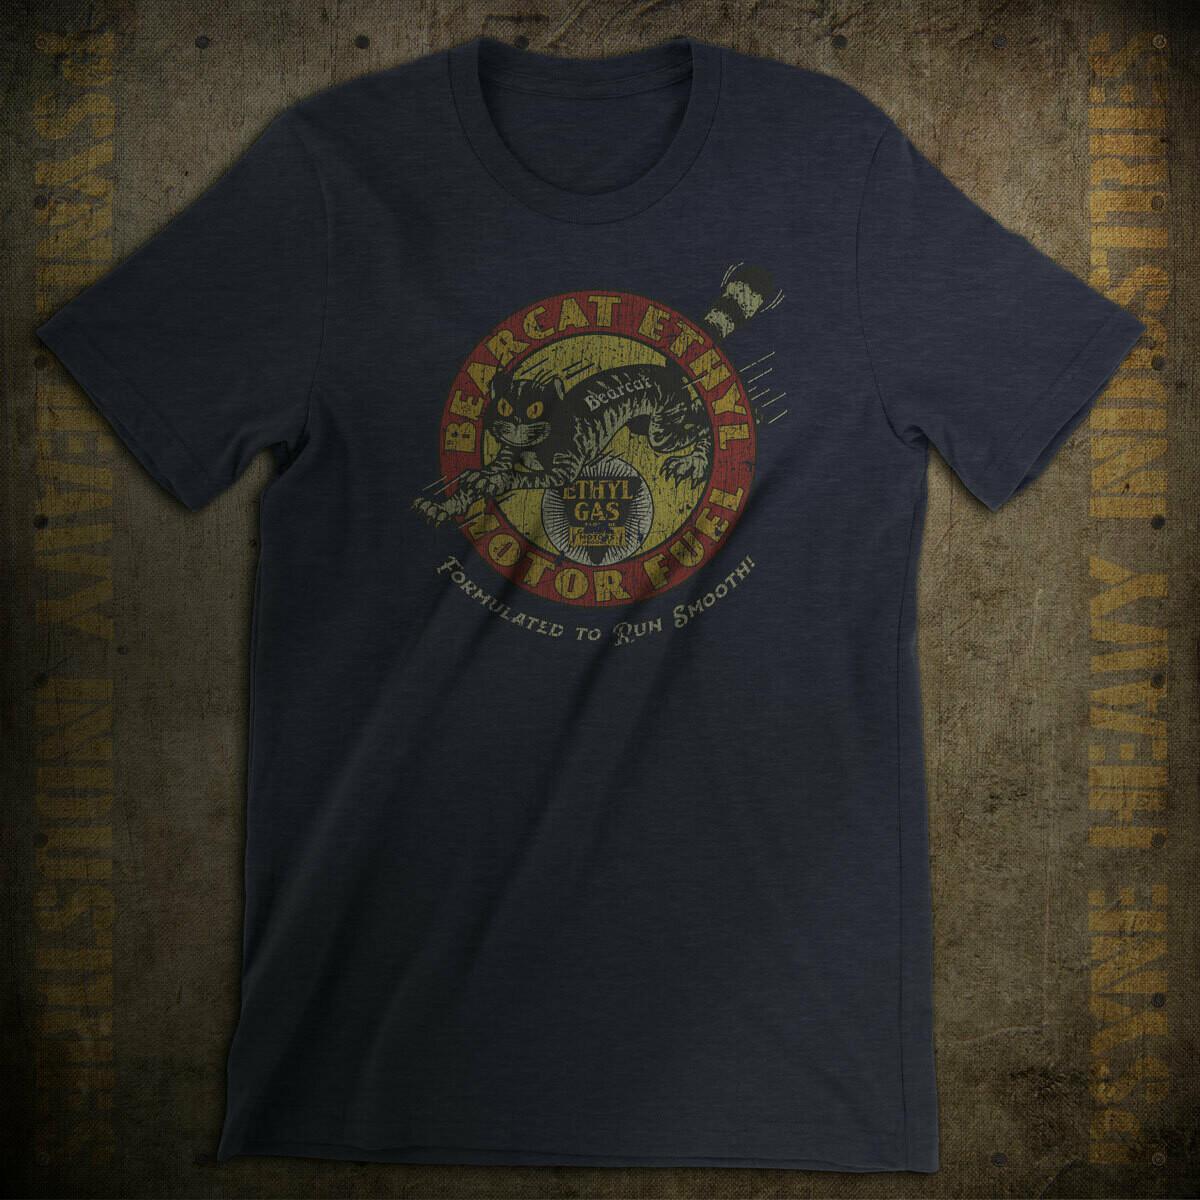 Bearcat Ethyl Motor Fuel Vintage T-Shirt